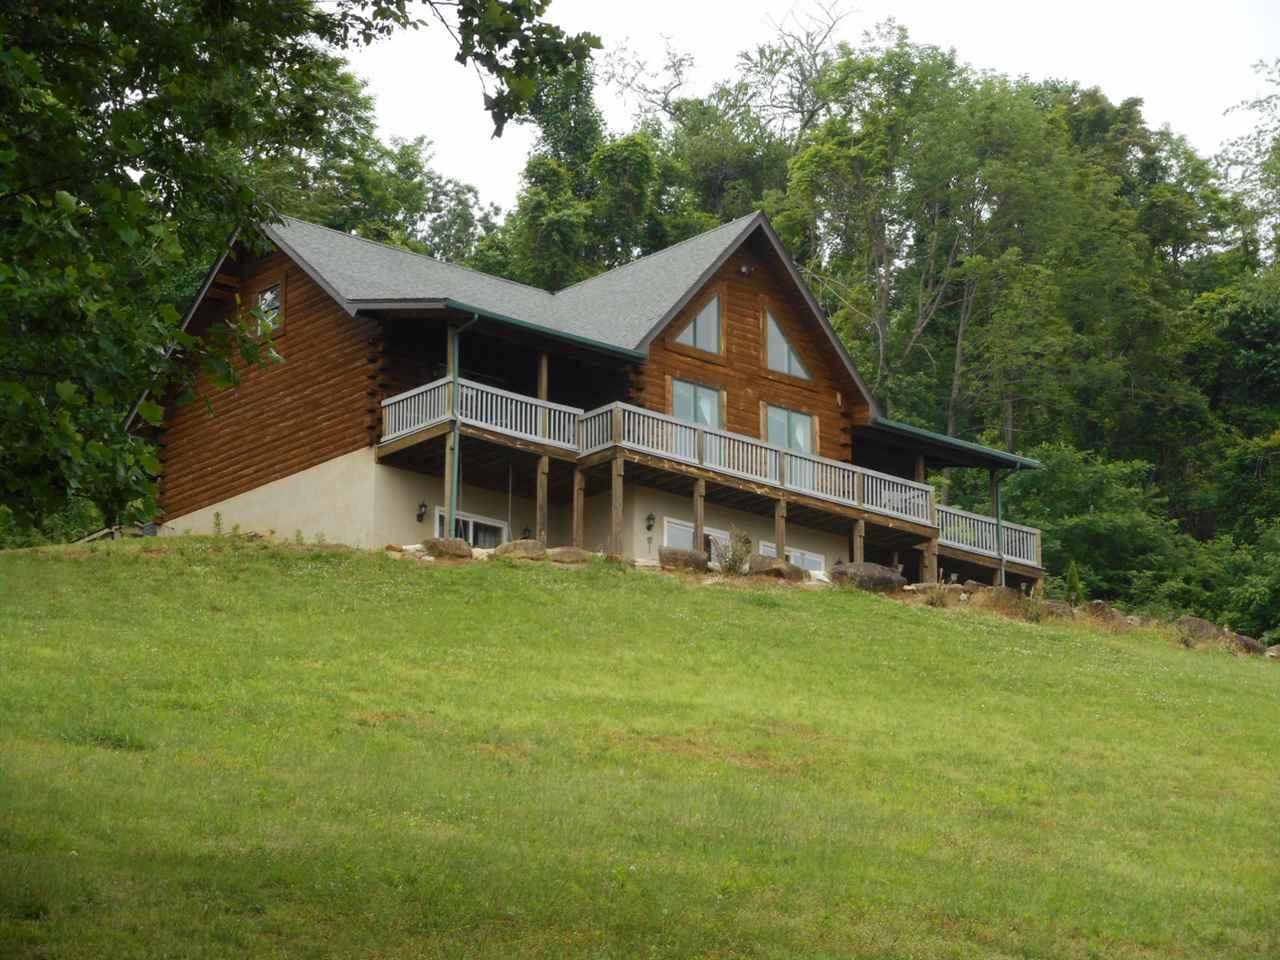 21577 FOREST HOMES DR, ELKTON, VA